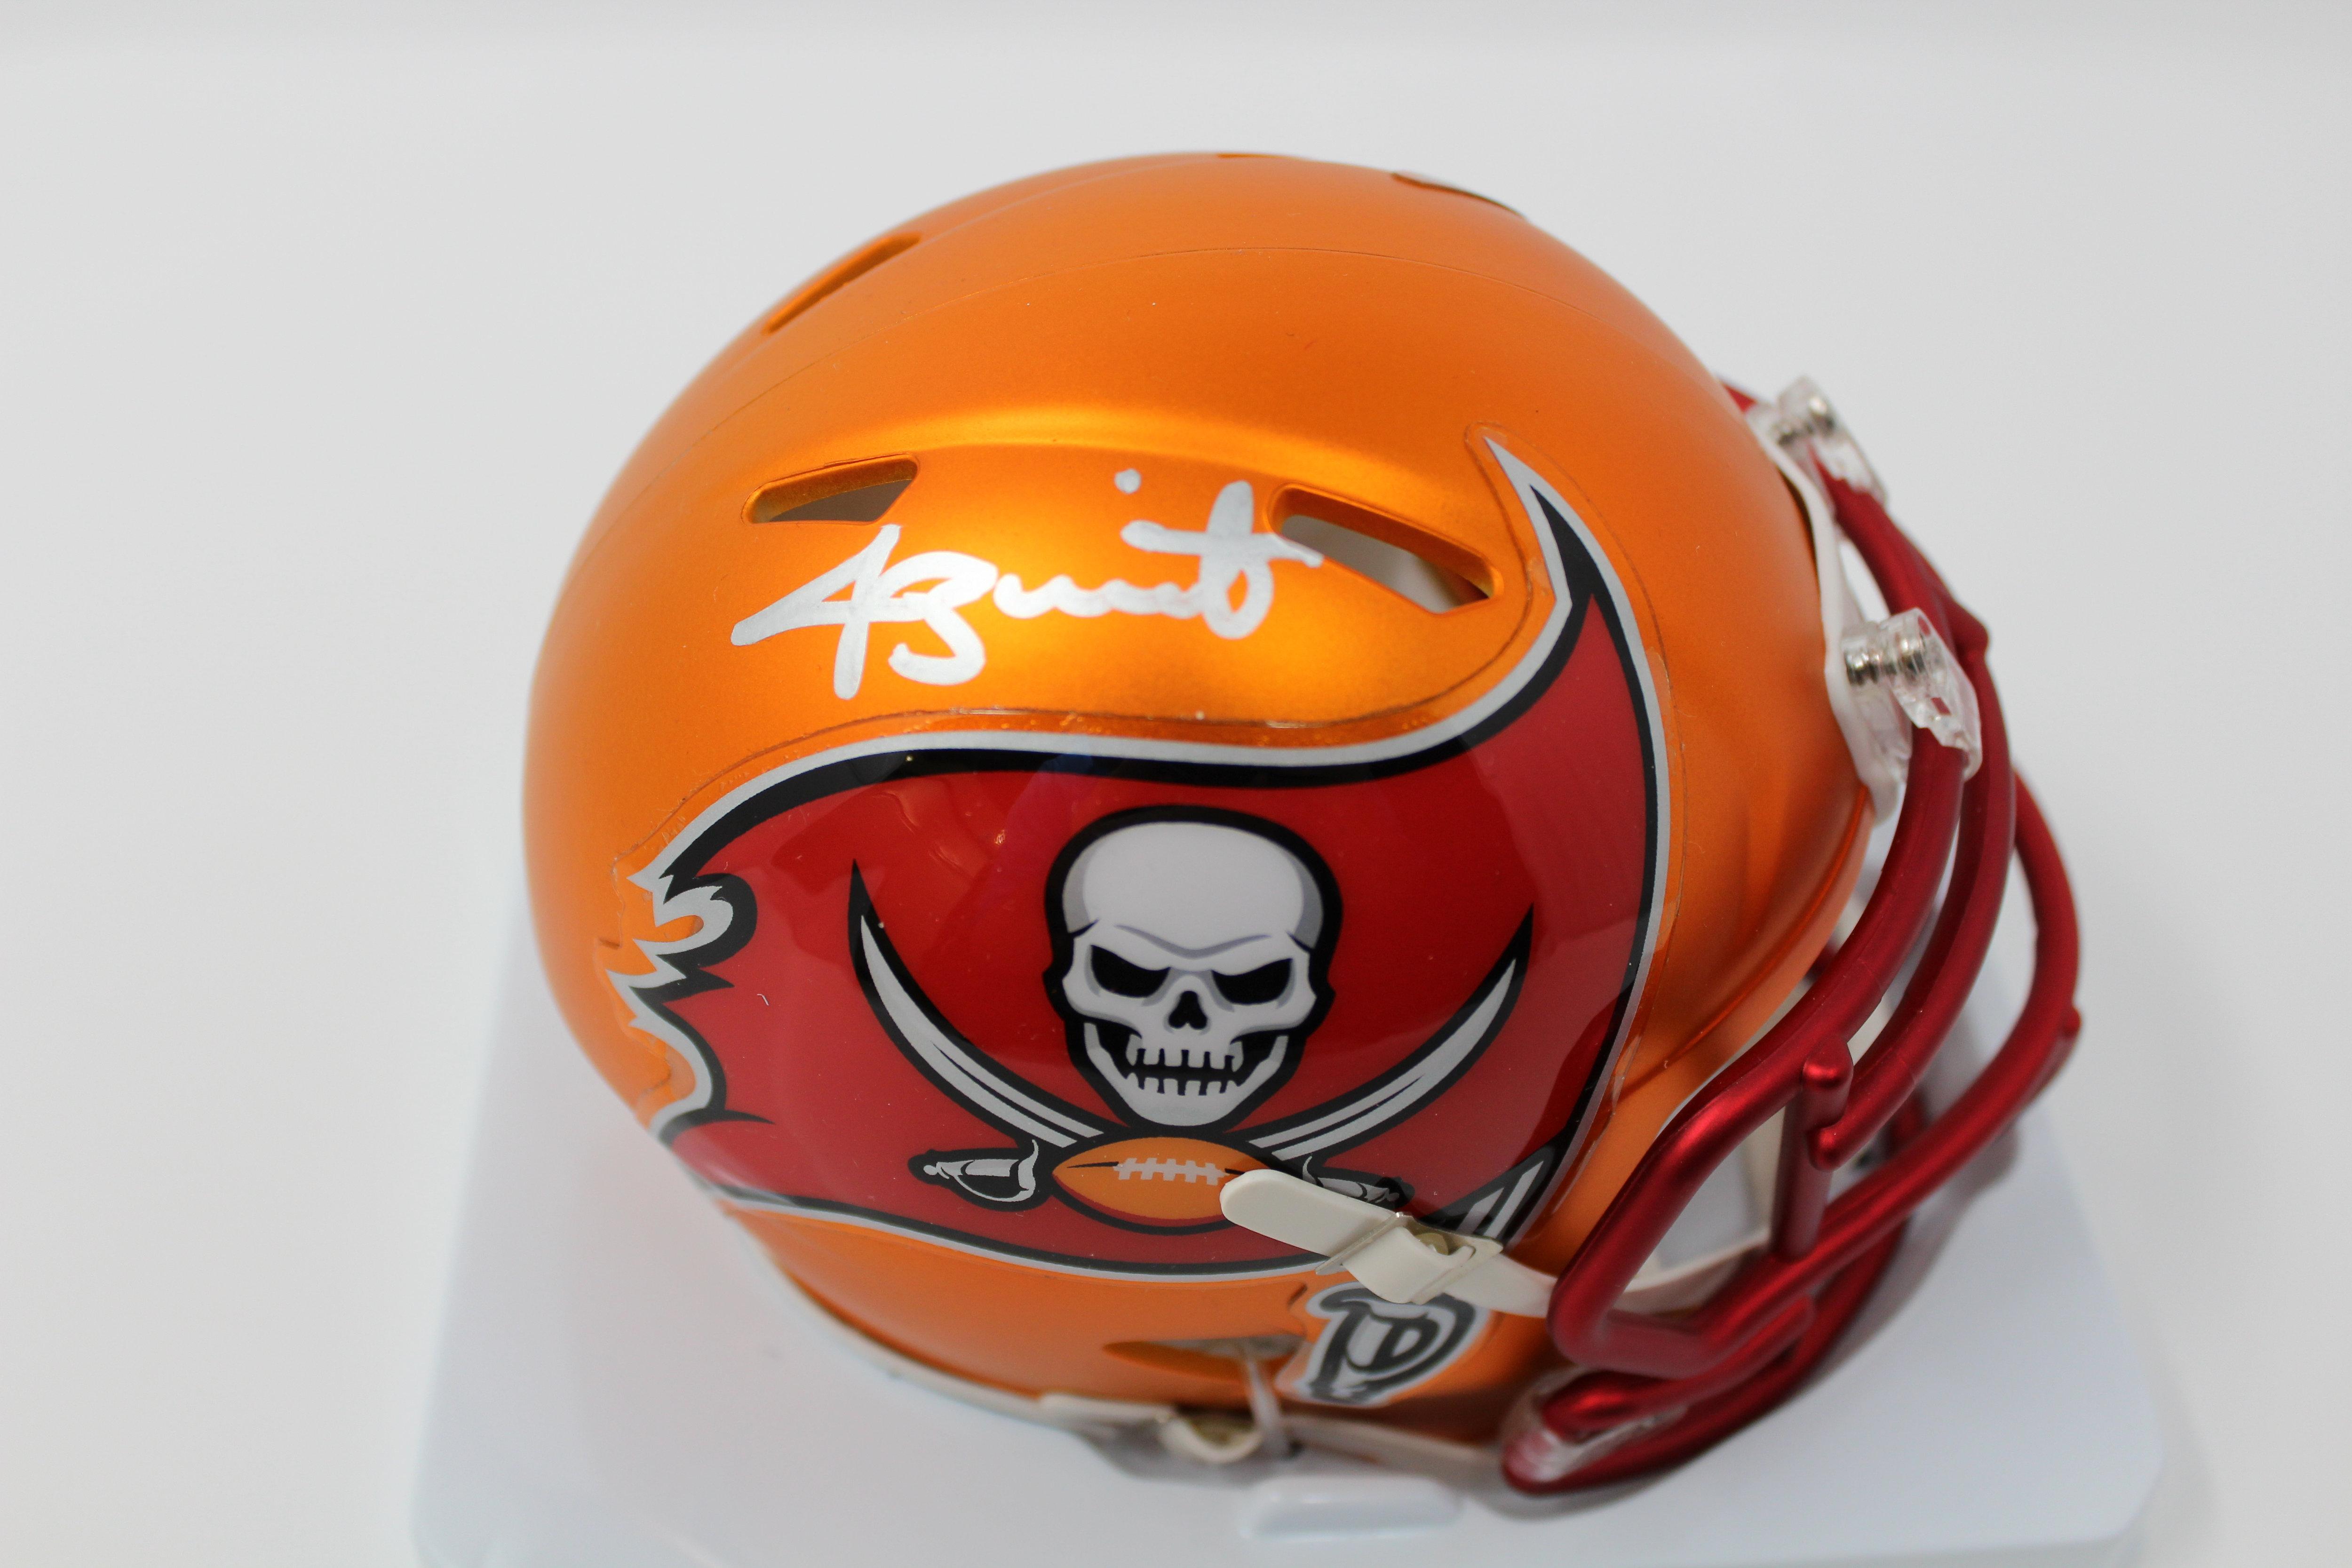 separation shoes 2ed88 76322 Jameis Winston Autographed Tampa Bay Buccaneers Blaze Mini Helmet